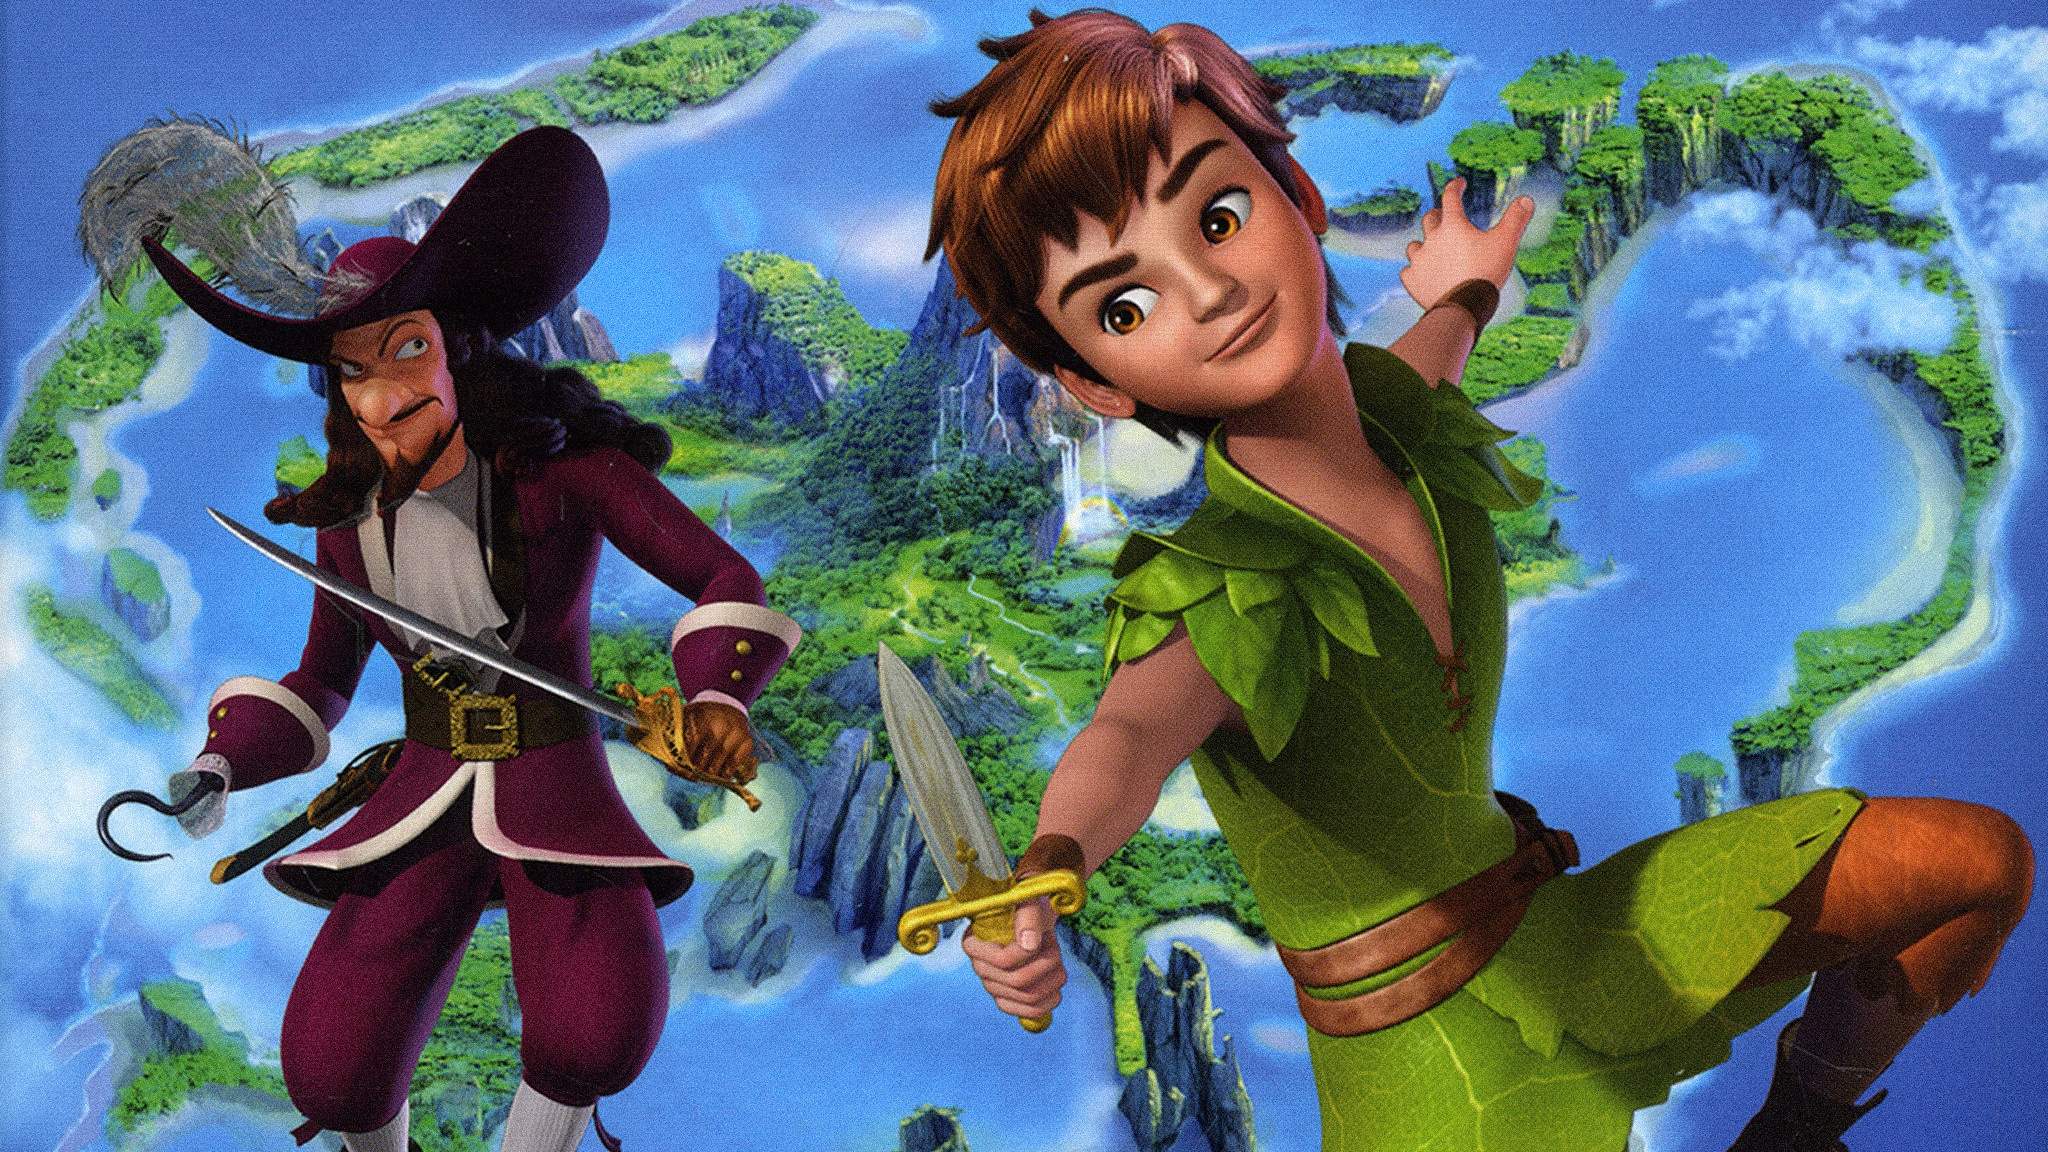 Rai Gulp Le nuove avventure di Peter Pan - S2E16 - I sette diamanti